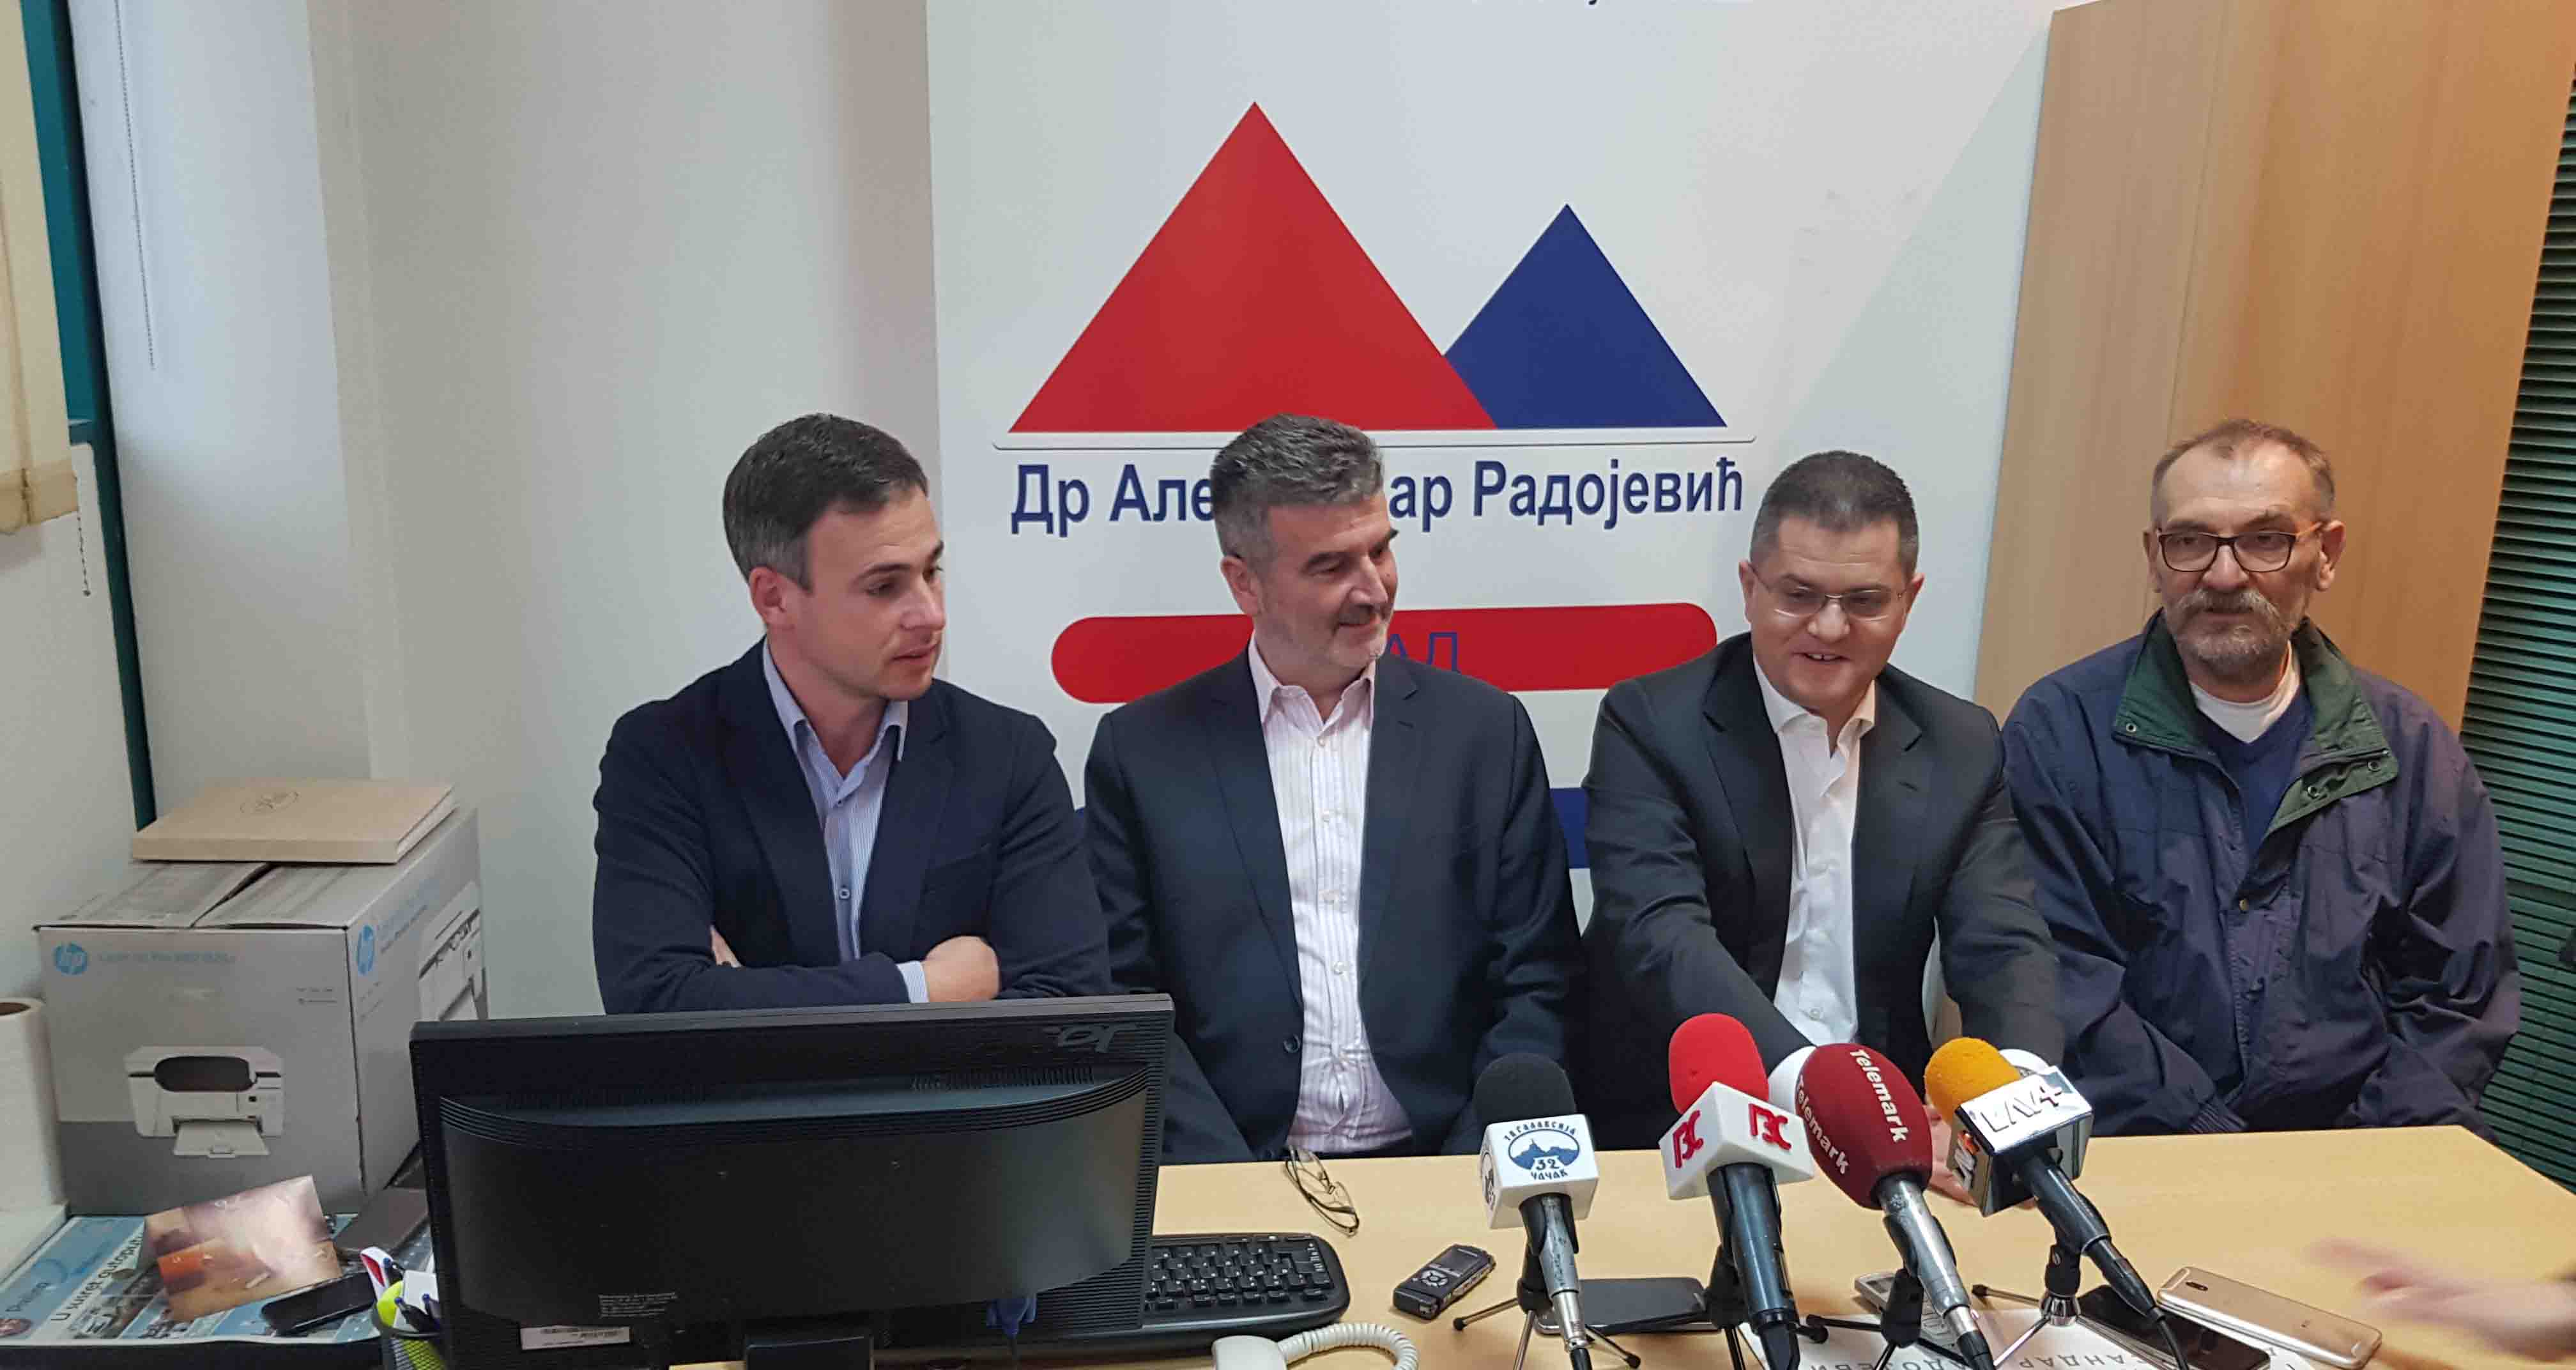 Народна странка Чачак: Основано повереништво, др Александар Радојевић повереник